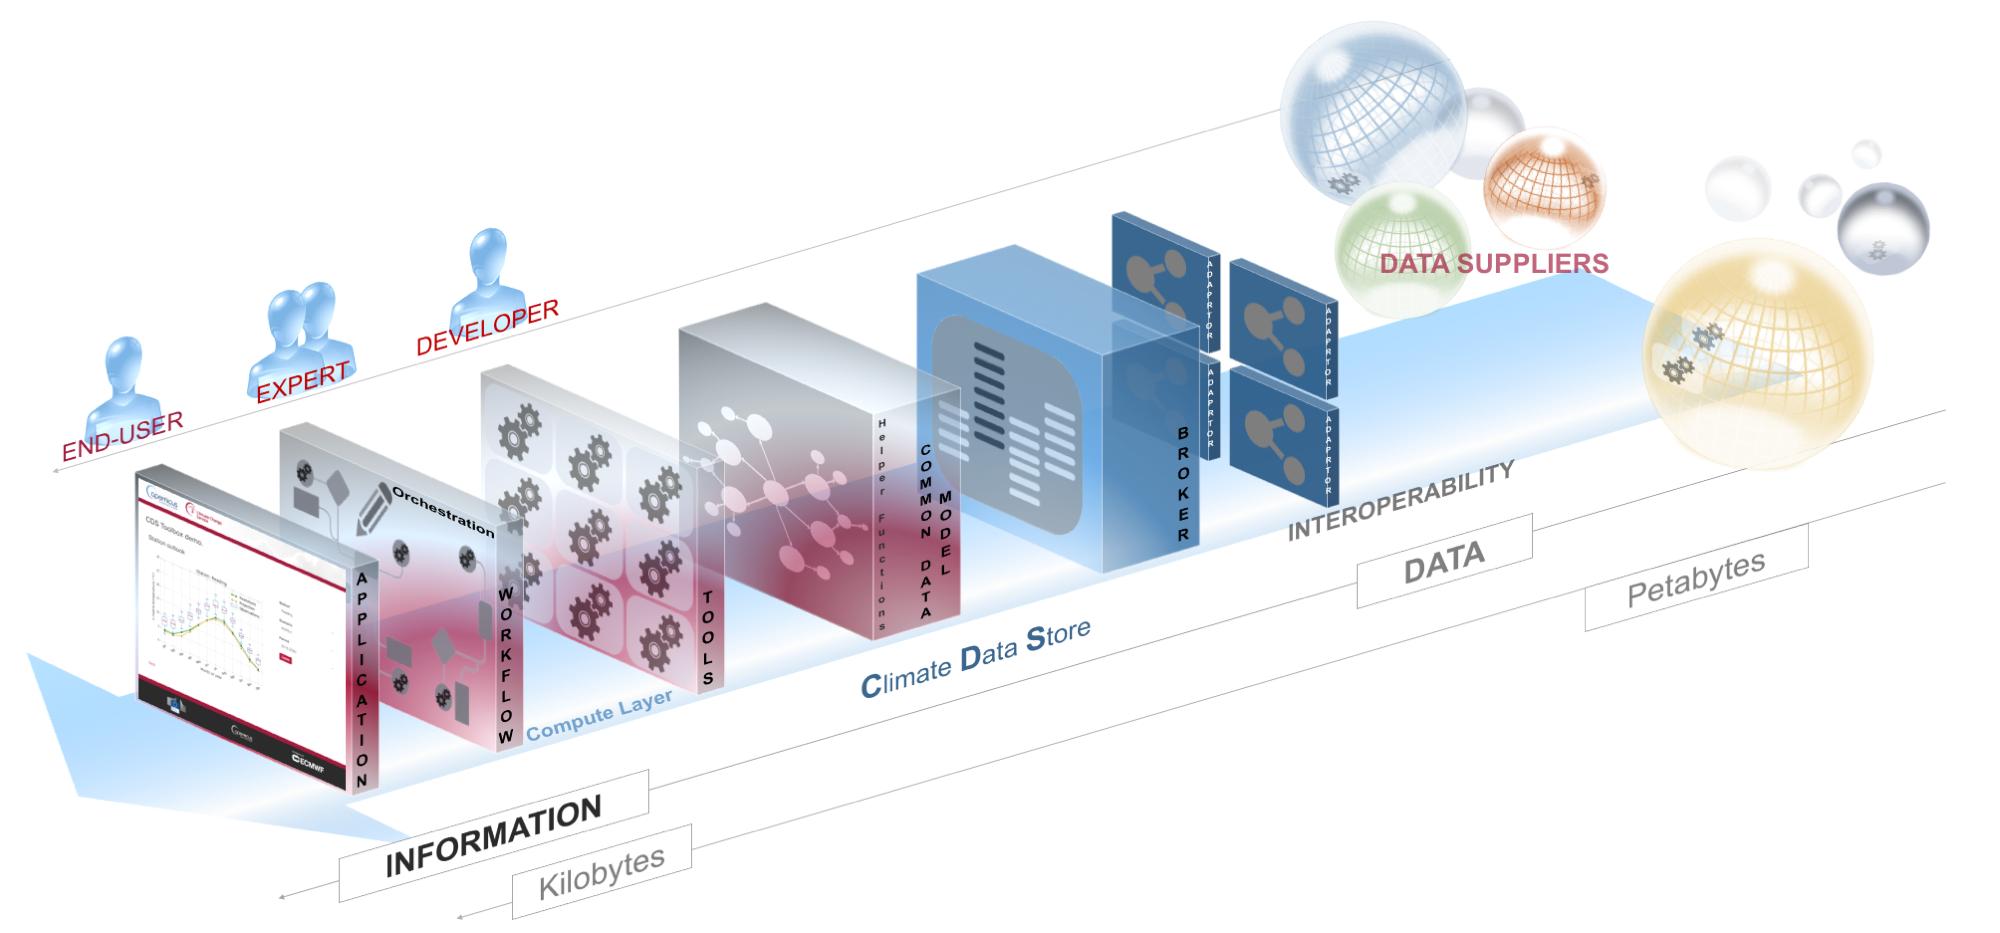 Climate service develops user-friendly data store | ECMWF